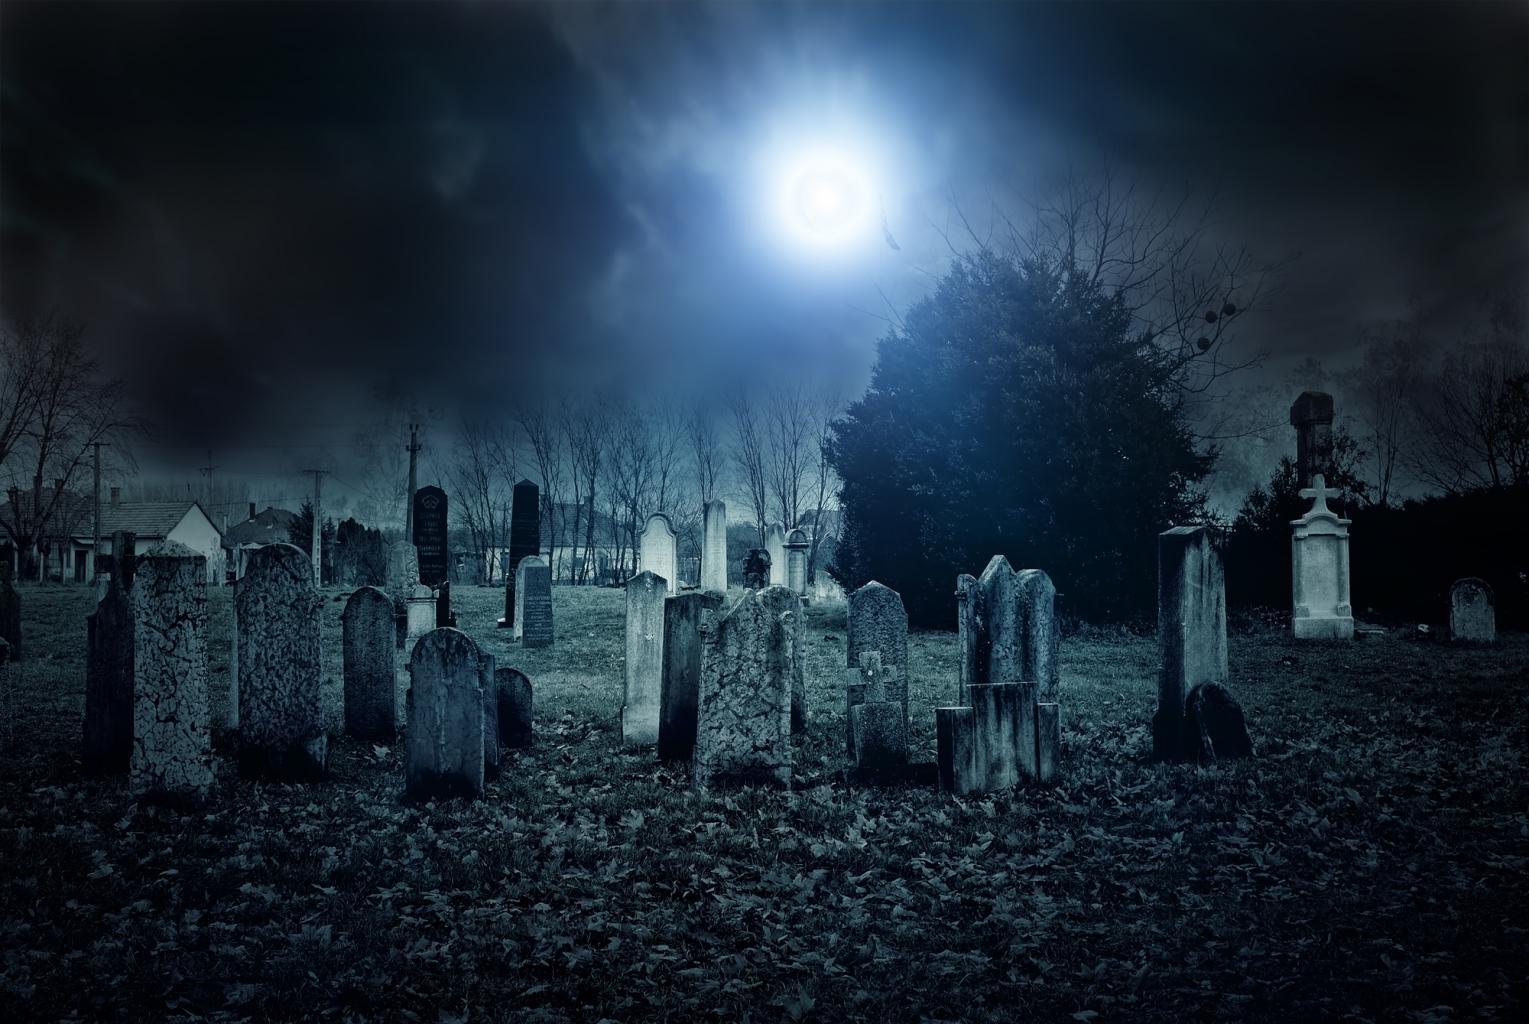 Münchens 4 seltsamste Ereignisse an Halloween 2019